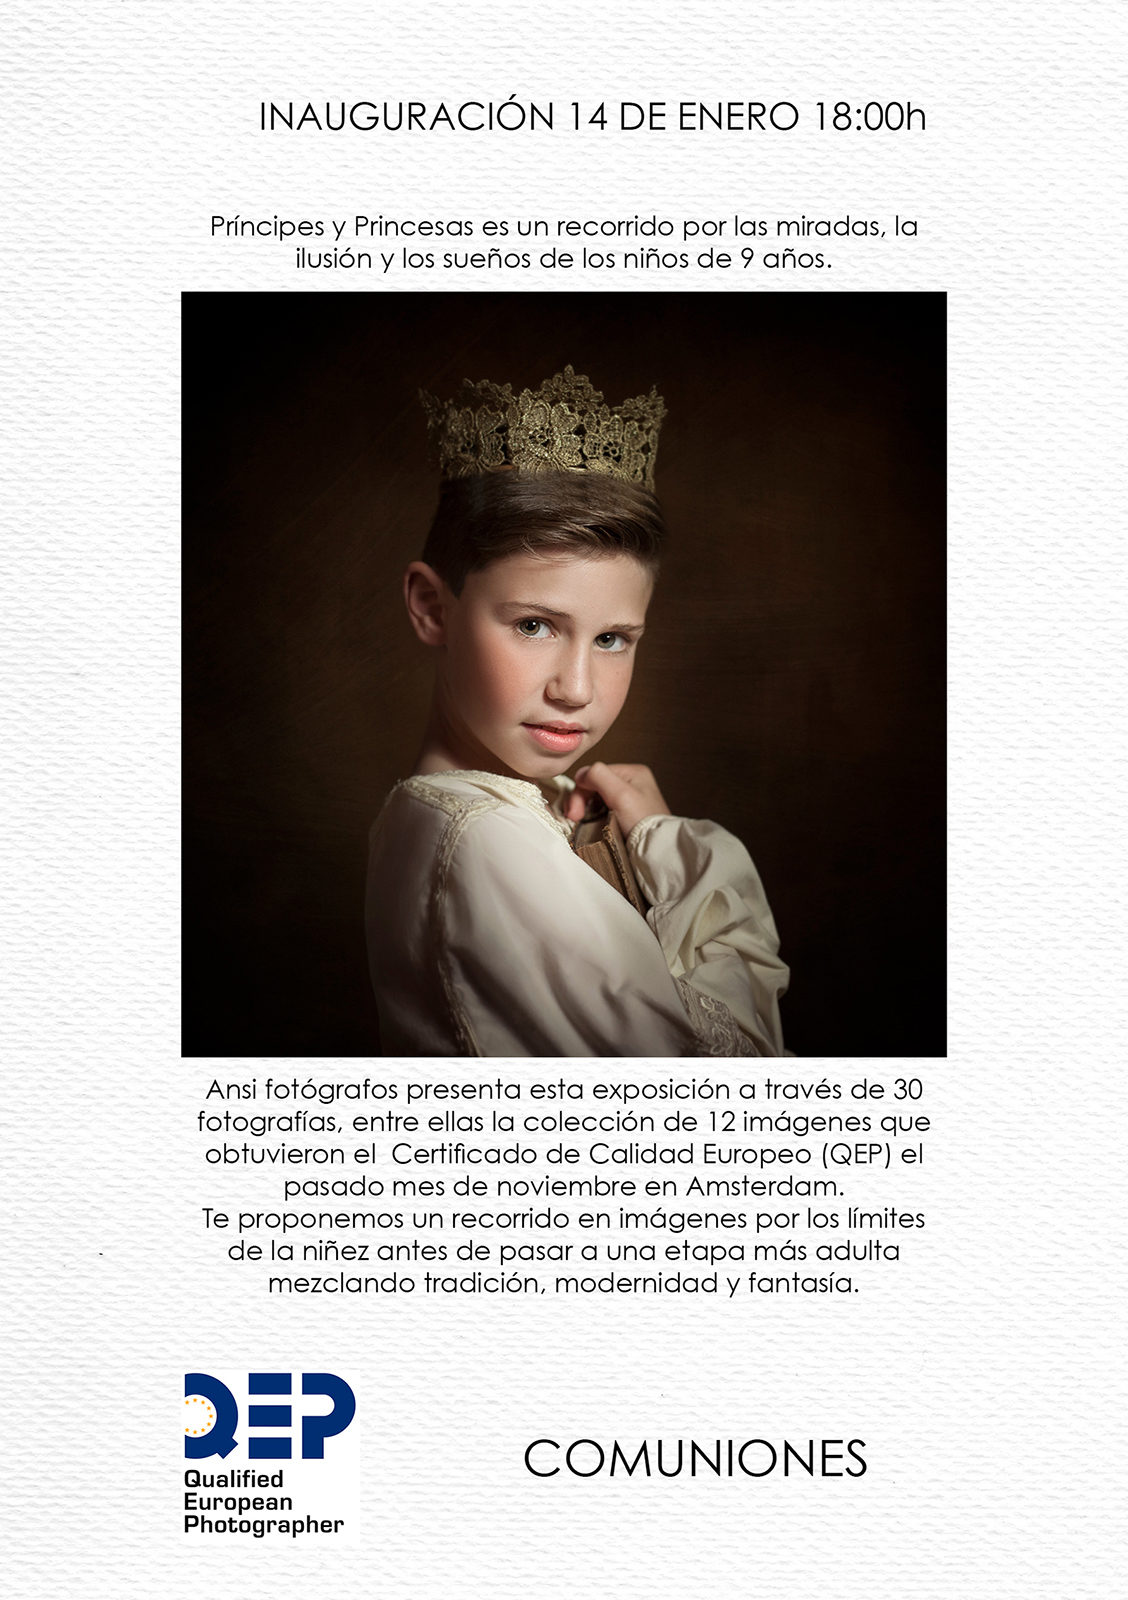 premio-QEP-ansi-fotografos-principes-princesas-exposicion-alaquas-castillo